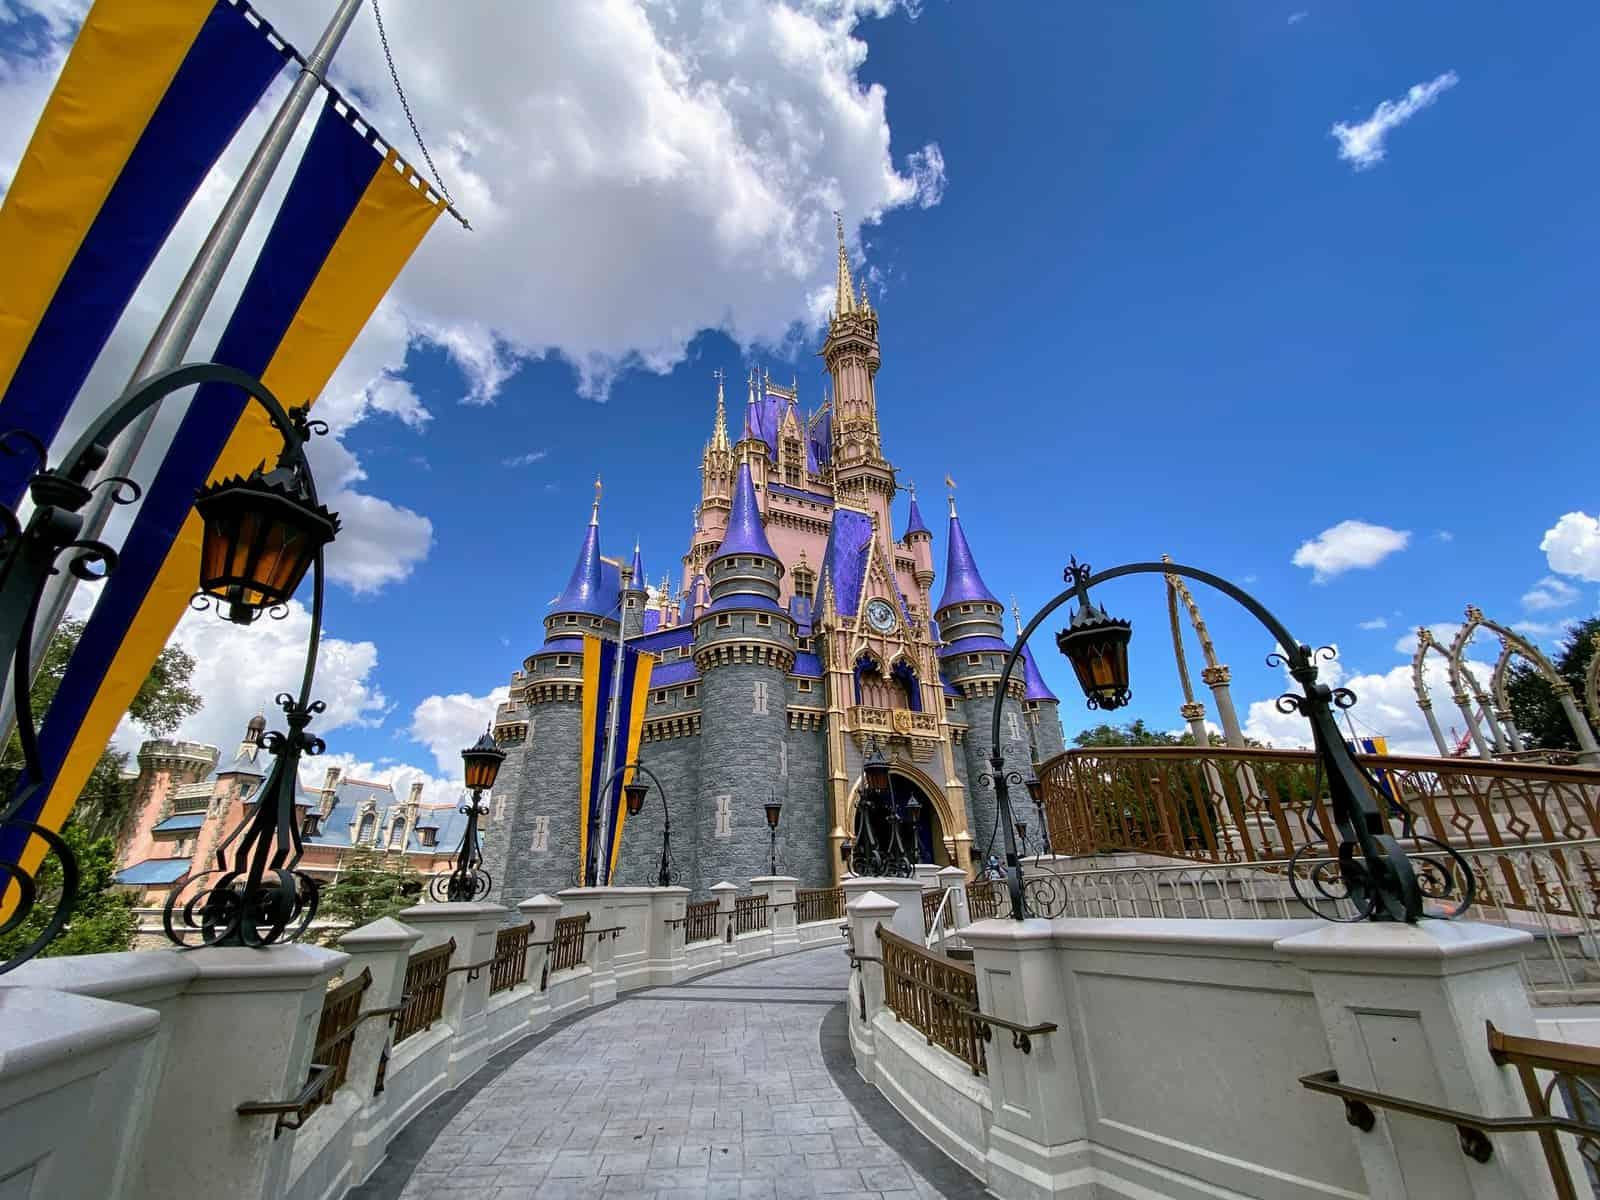 Pink Cinderella Castle at Magic Kingdom